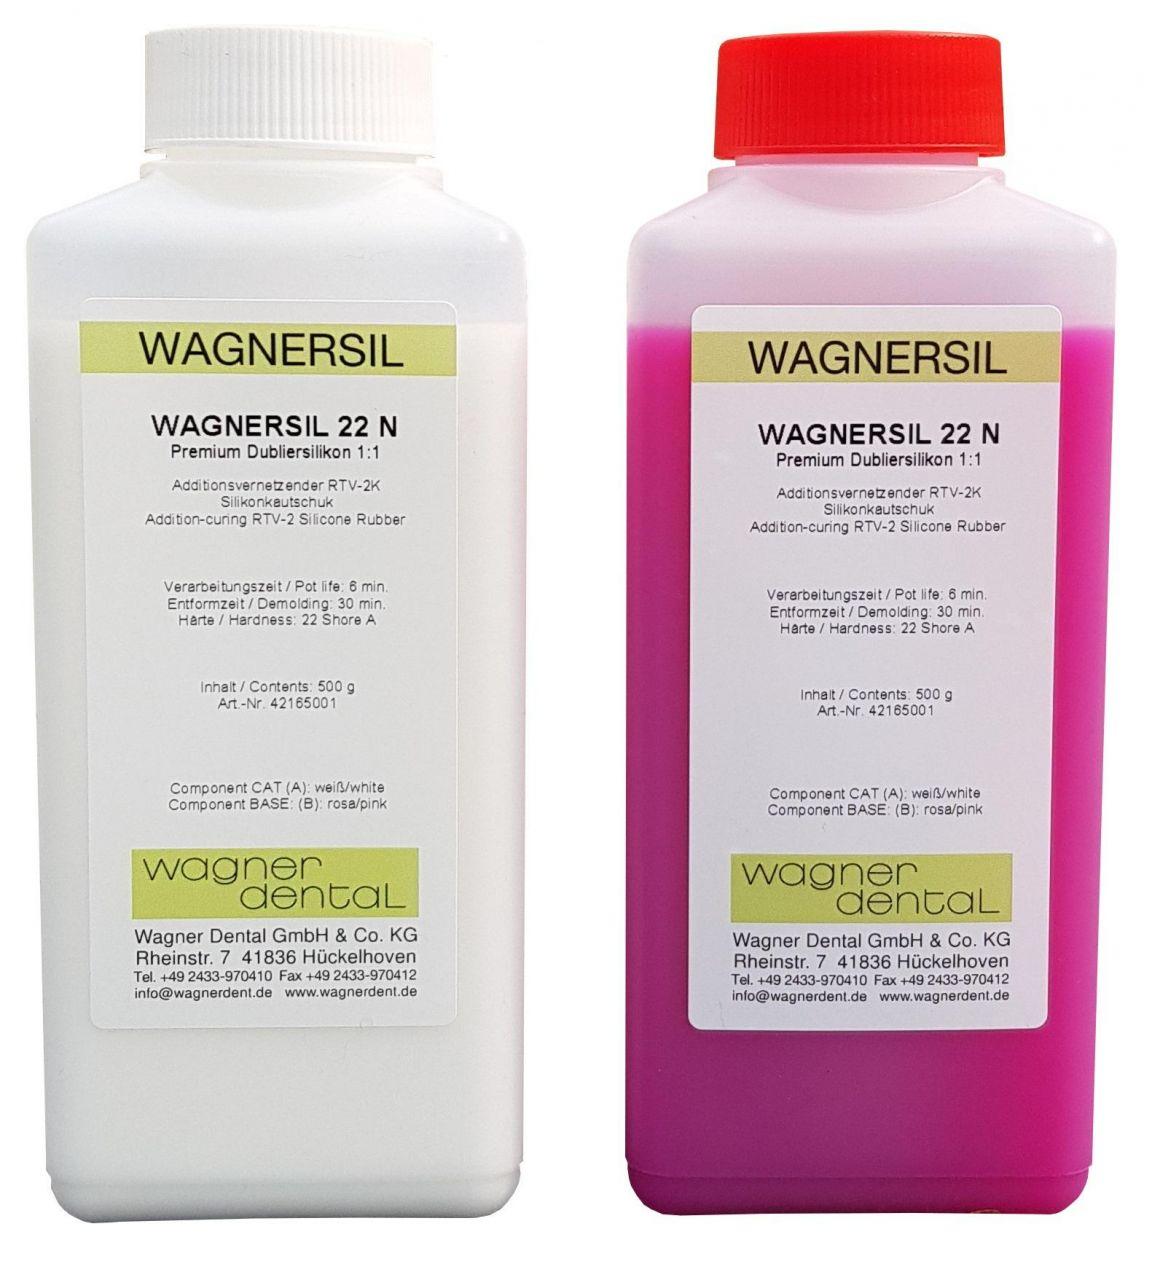 Wagnersil Premium 22 N rosa Shore 22 EFZ 30 min 1:1